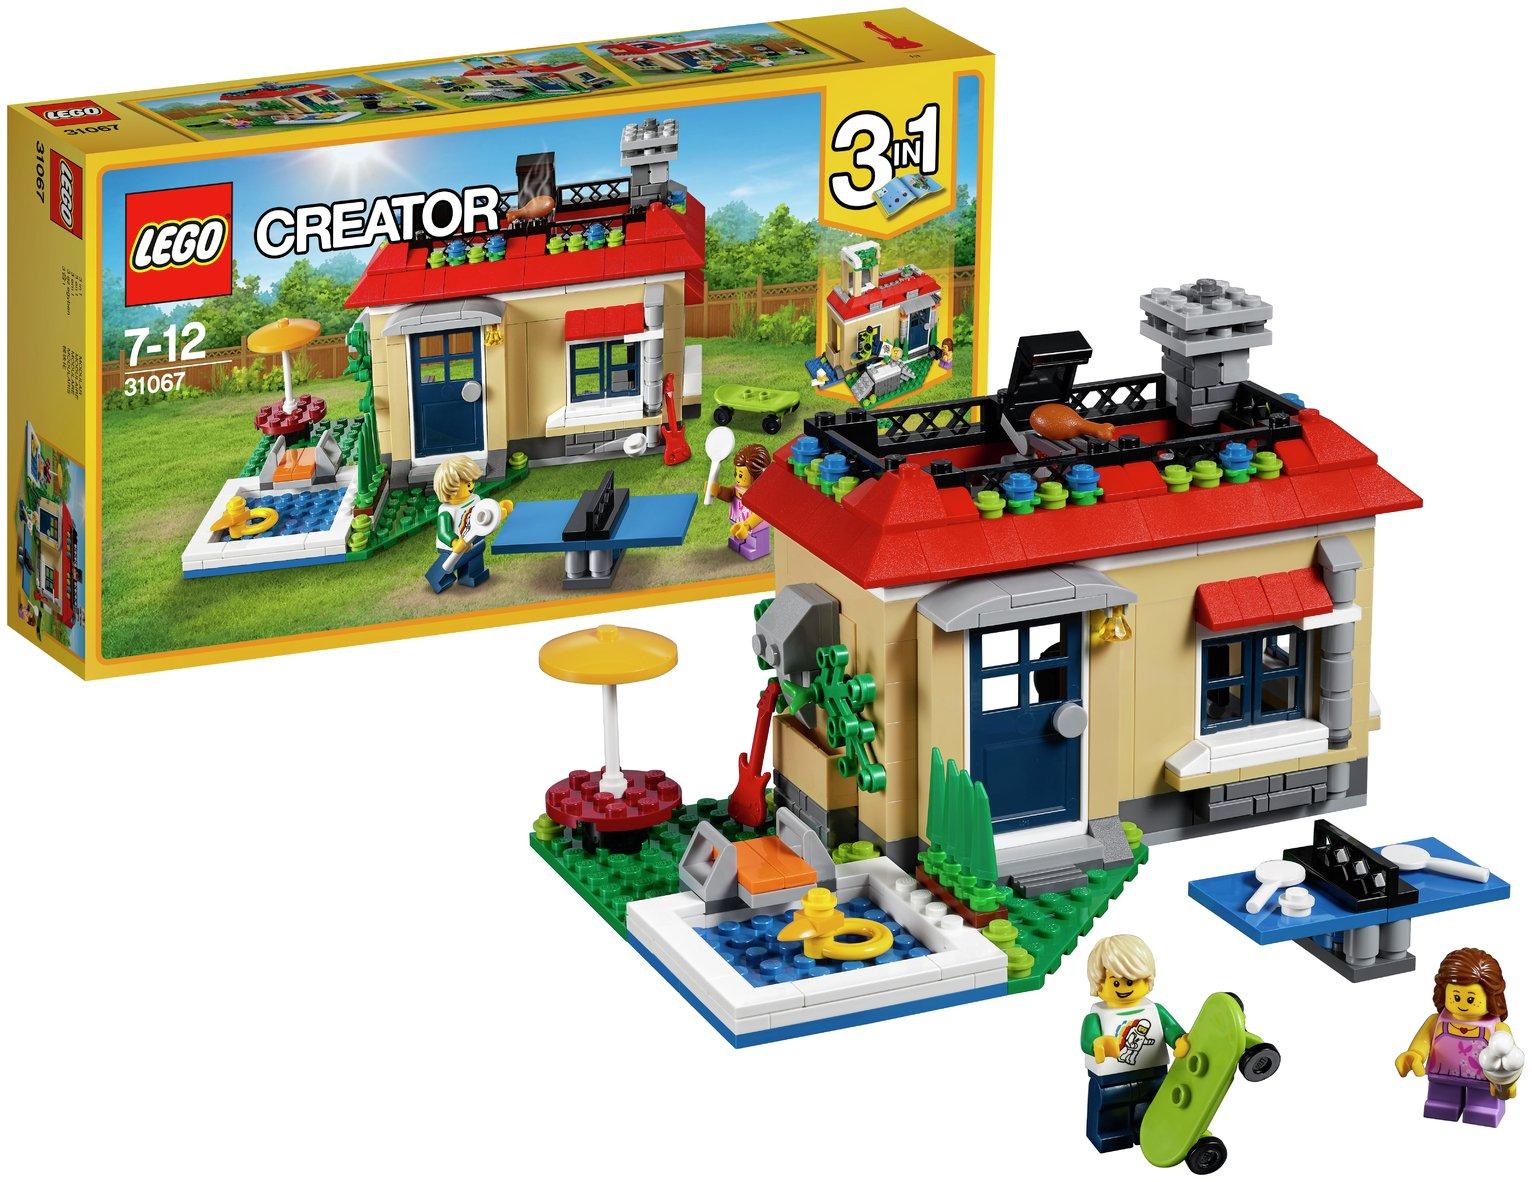 LEGO Creator Modular Poolside Holiday   31067.